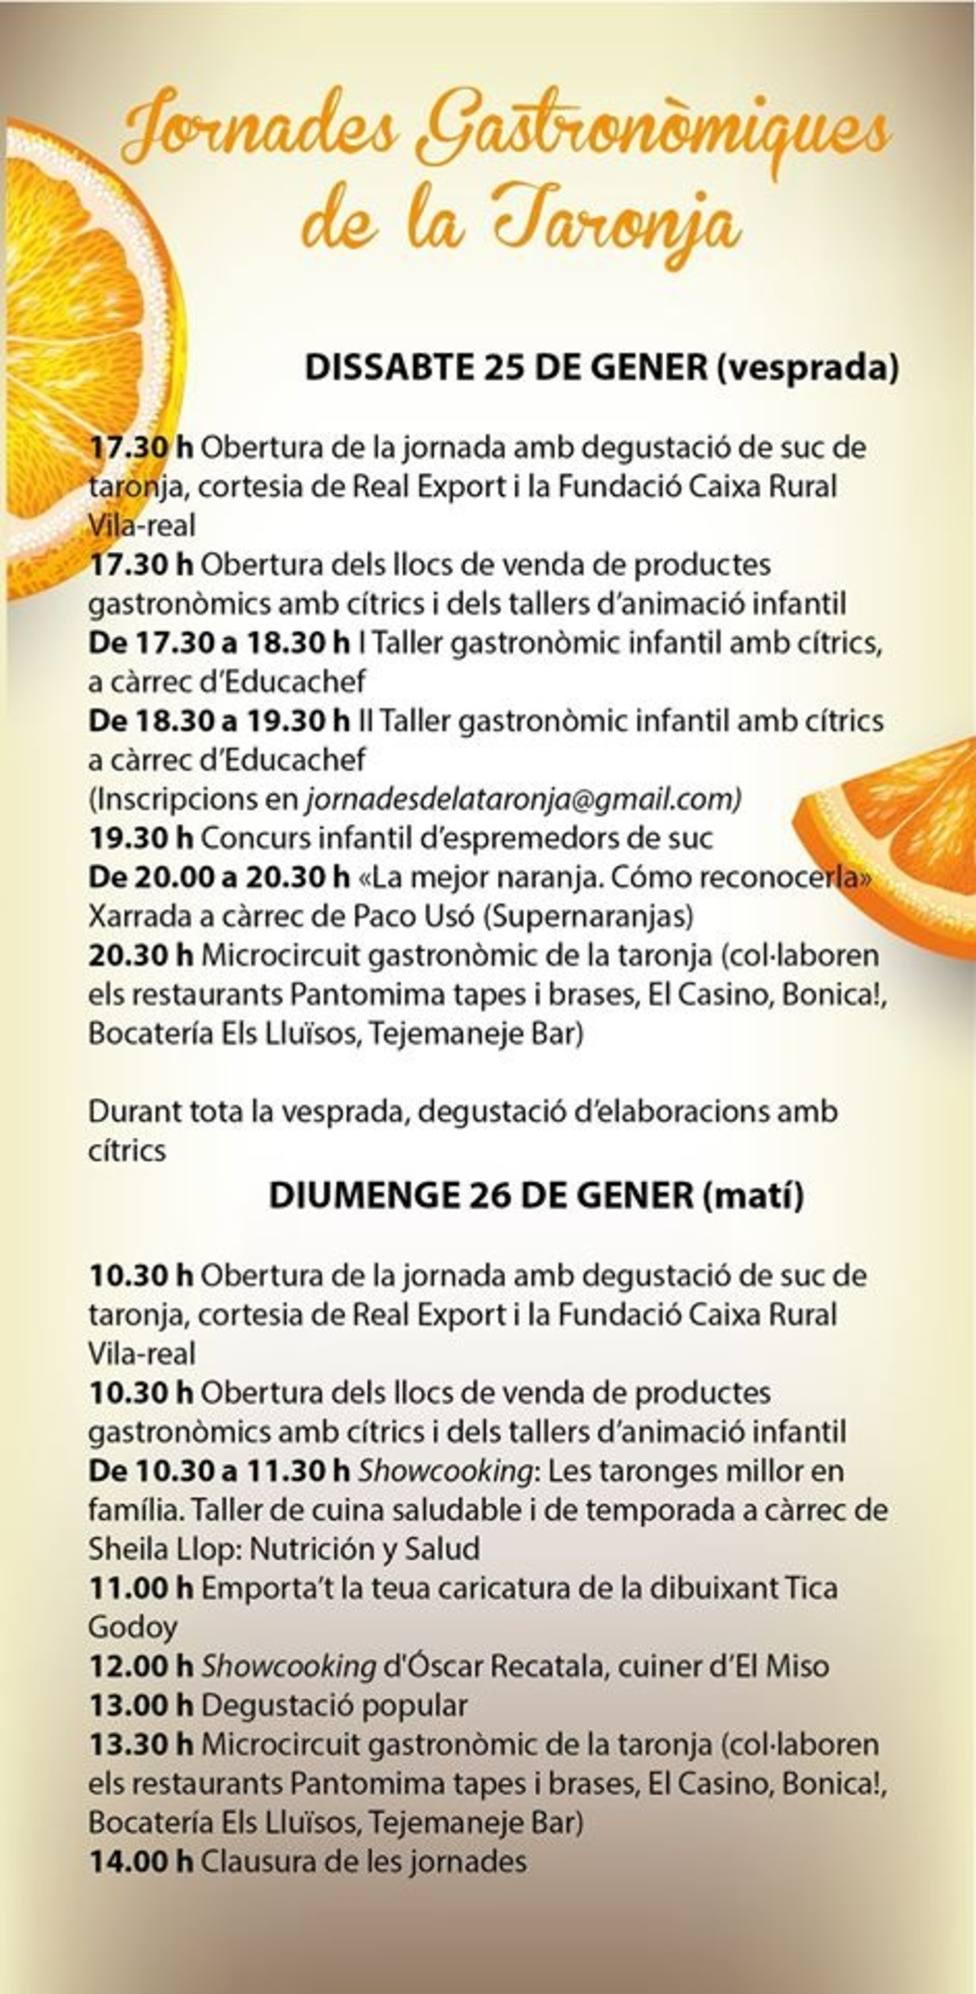 ctv-vff-cartell-jornades-taronja-1